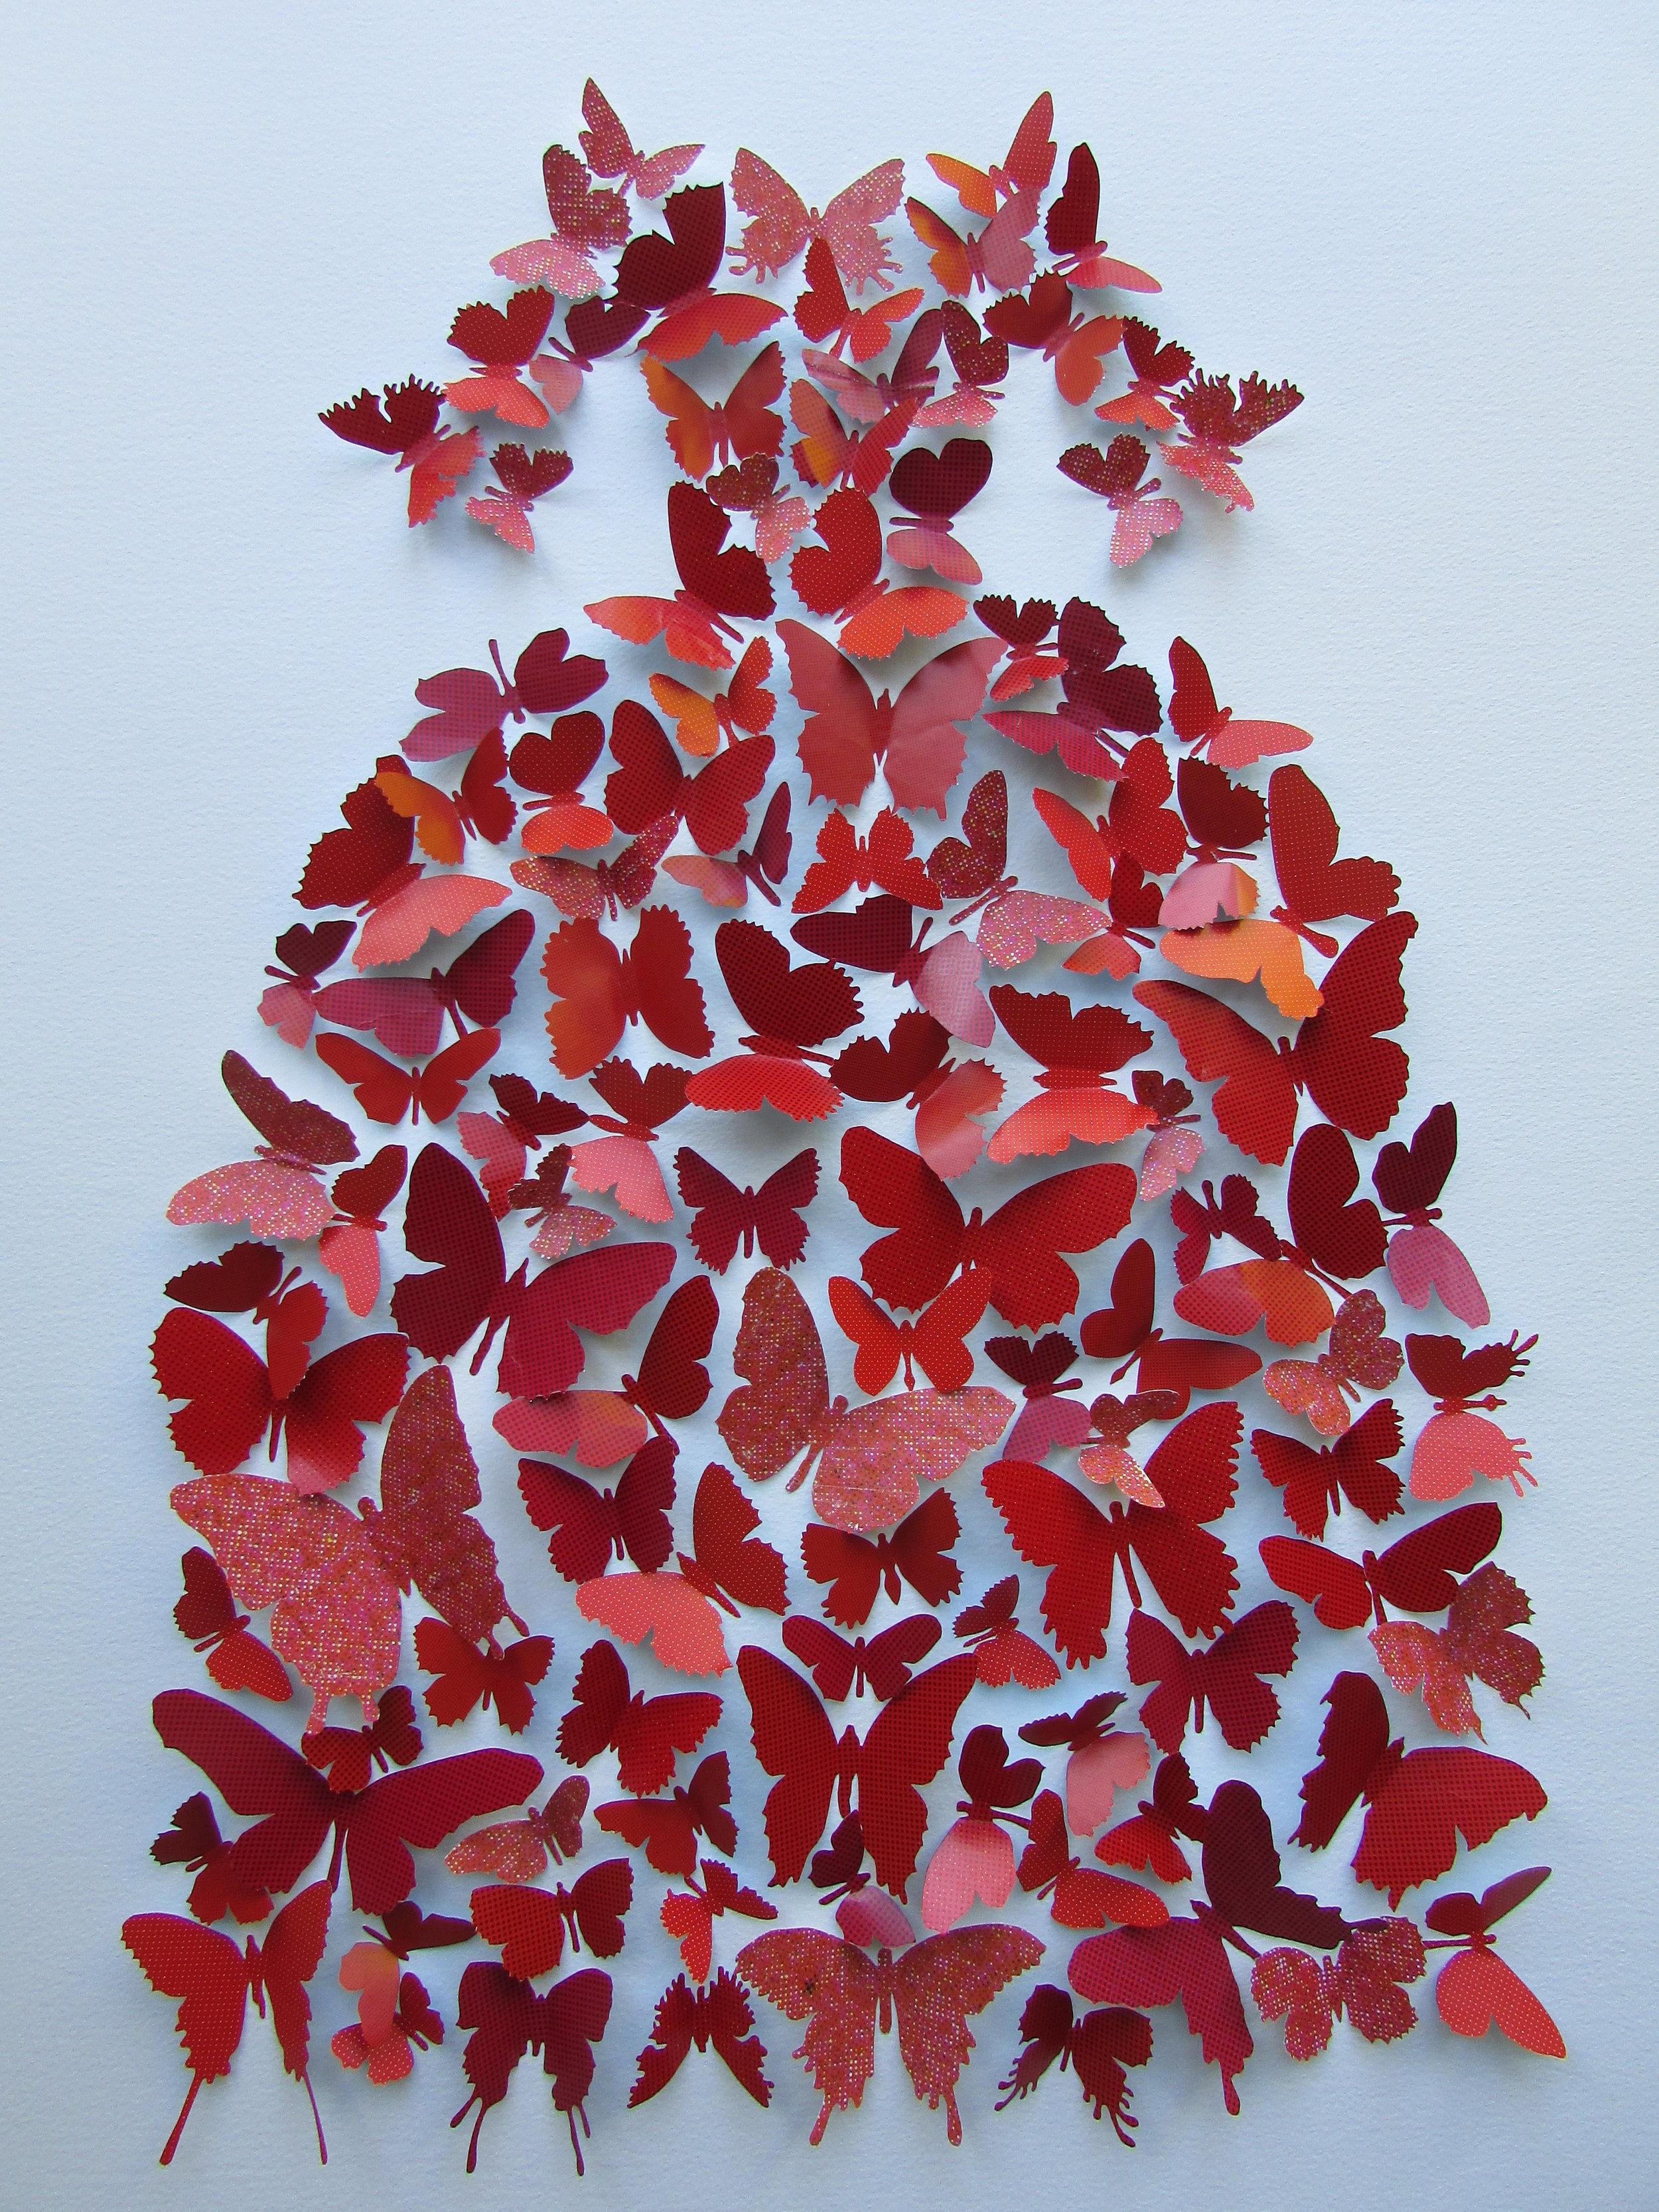 Pequena Princessa Roja  mixed media  75 x 55 cm